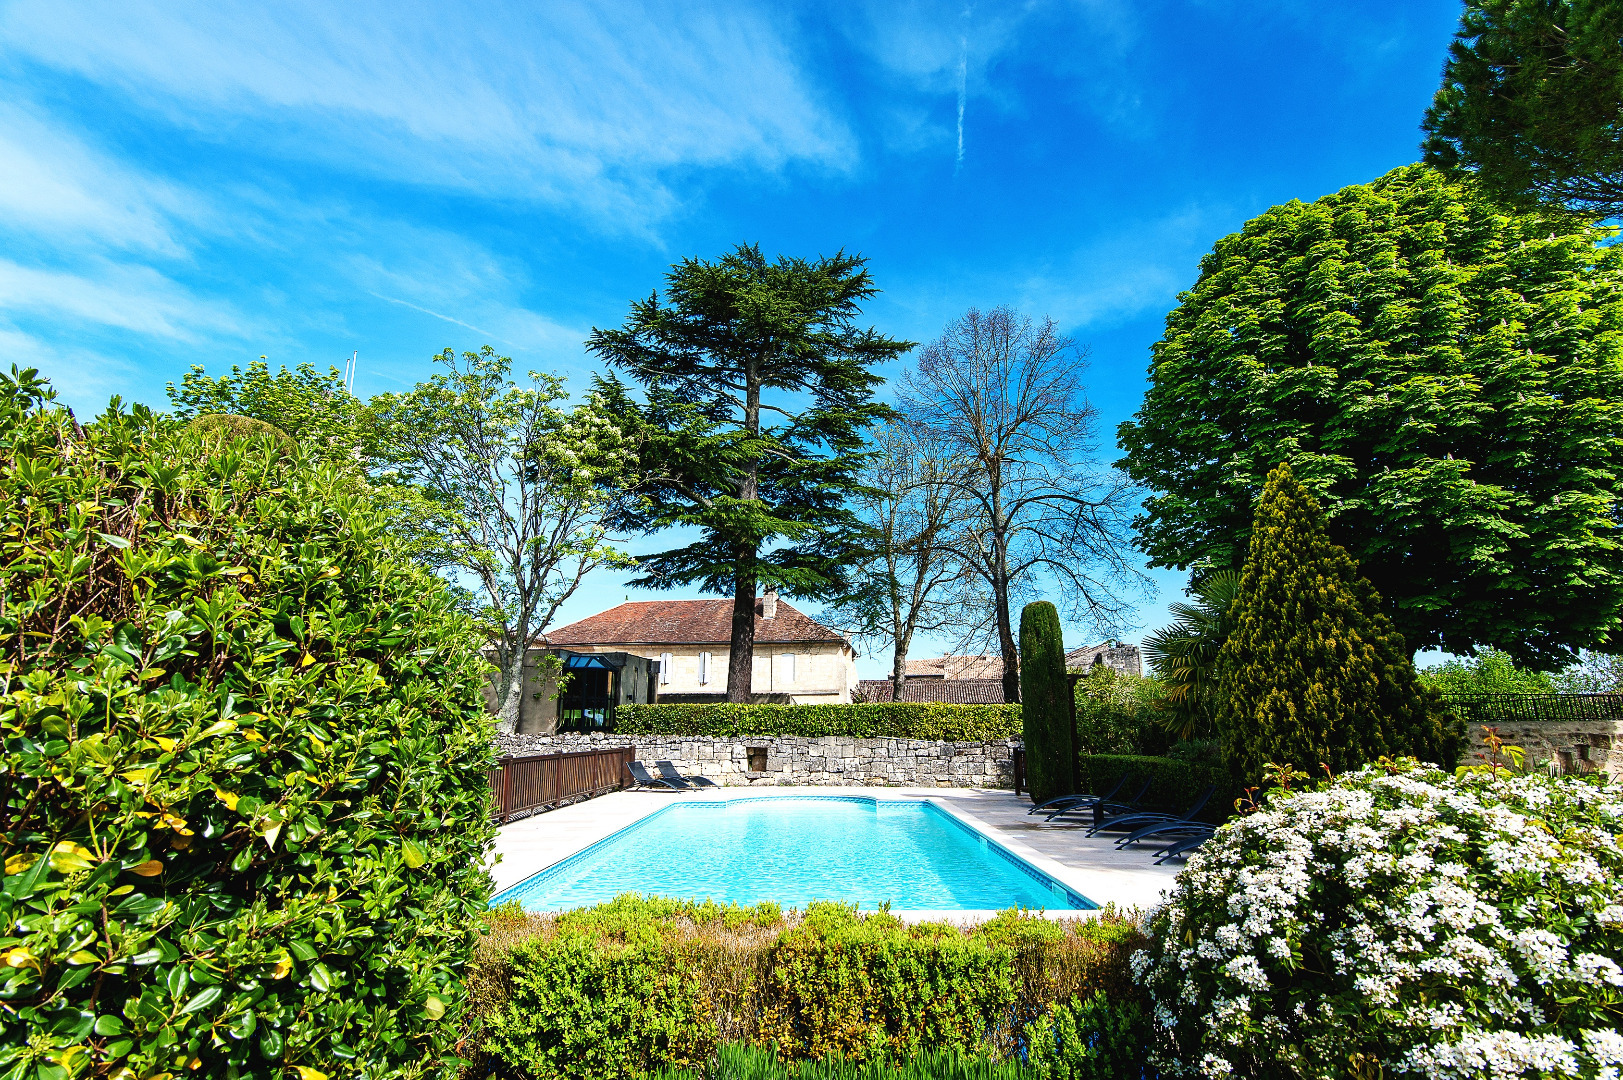 Hotel st emilion avec piscine for Piscine des remparts